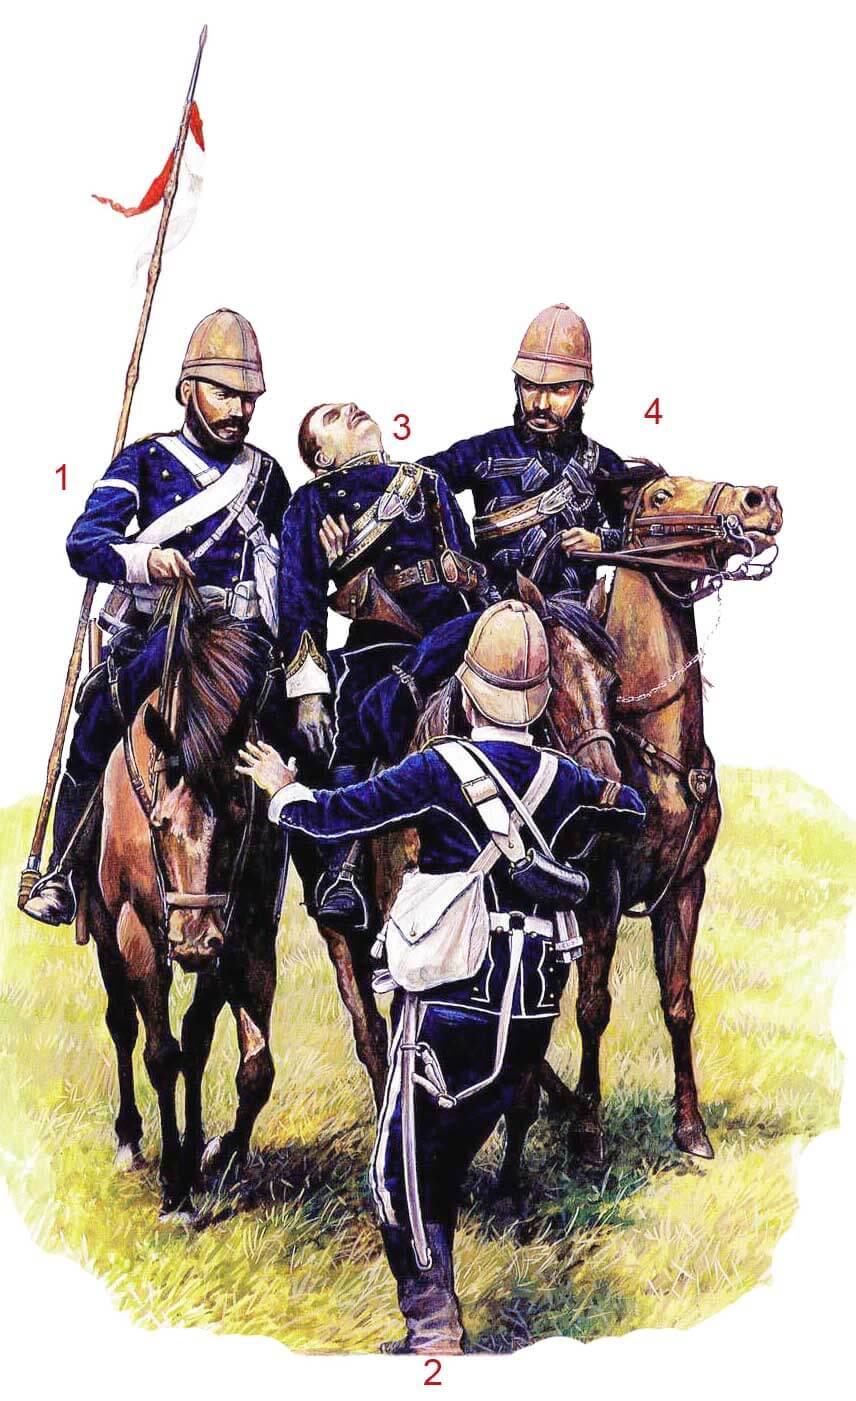 Смерть лейтенанта и адъютанта Ф. Дж. Кокаи Фрит (F. J. Cockaye Frith), 17-й уланский полк, река Упоко (Upoko River) страна Зулу, 5 июня 1879 года